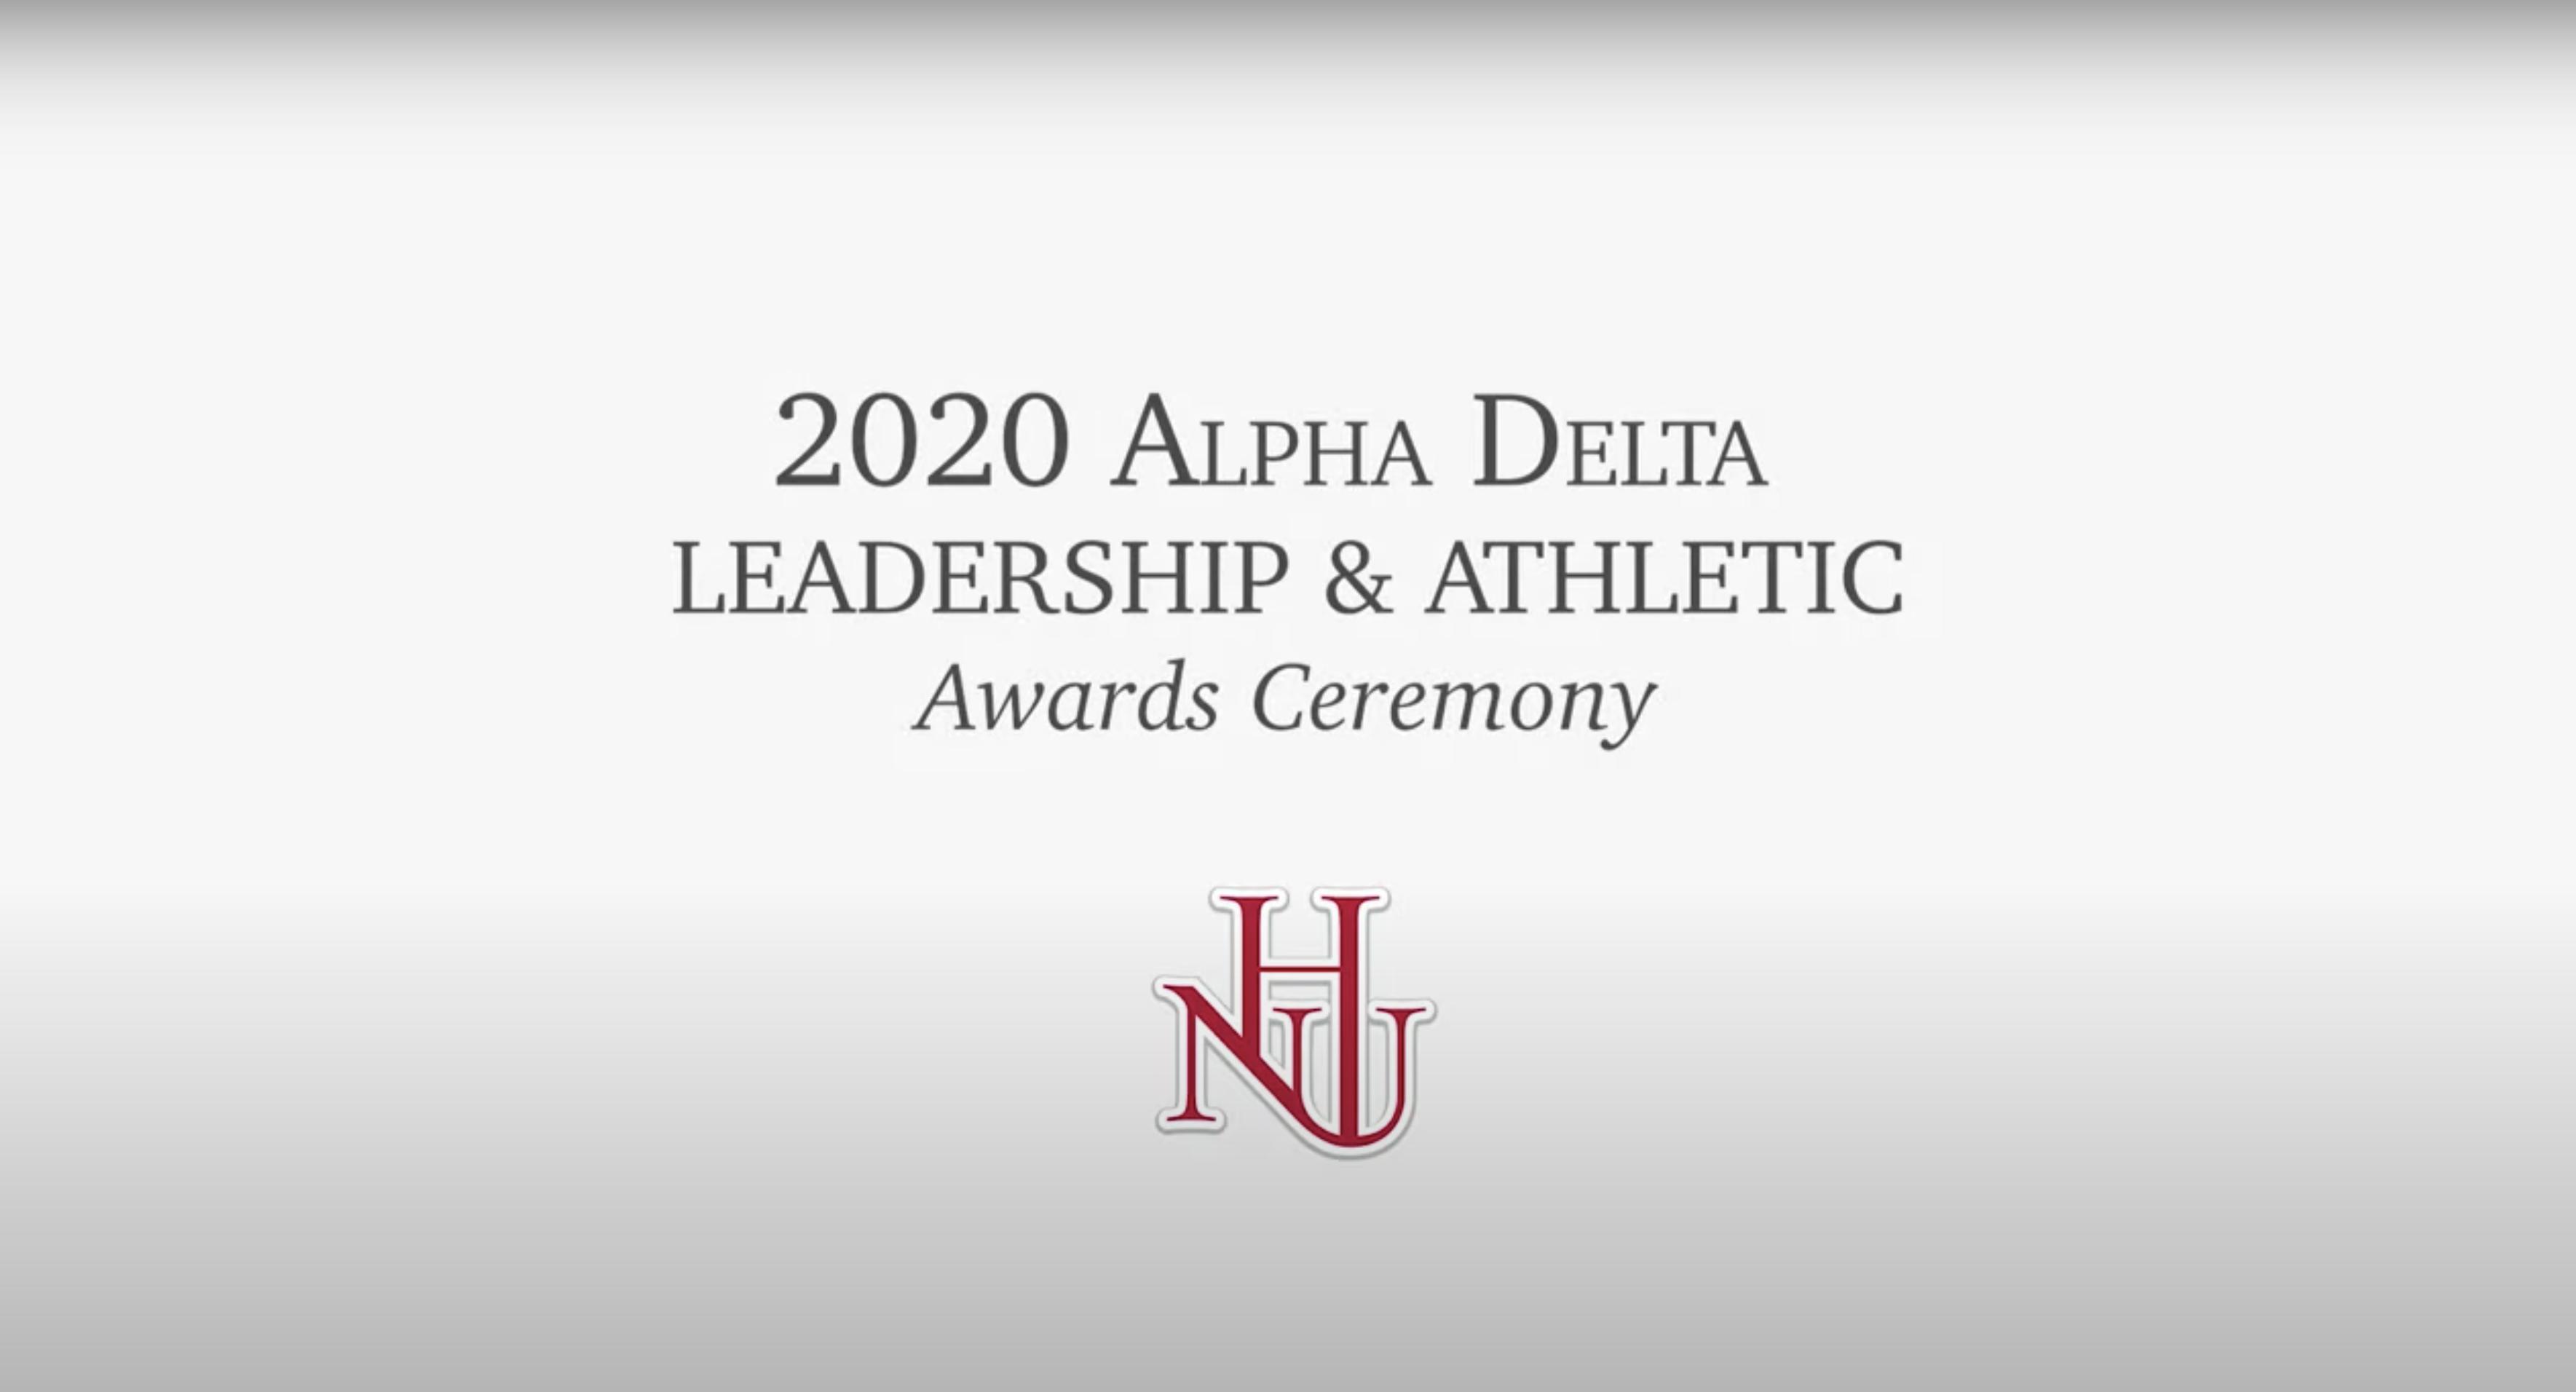 2020 Alpha Delta Leadership & Athletic Awards Ceremony